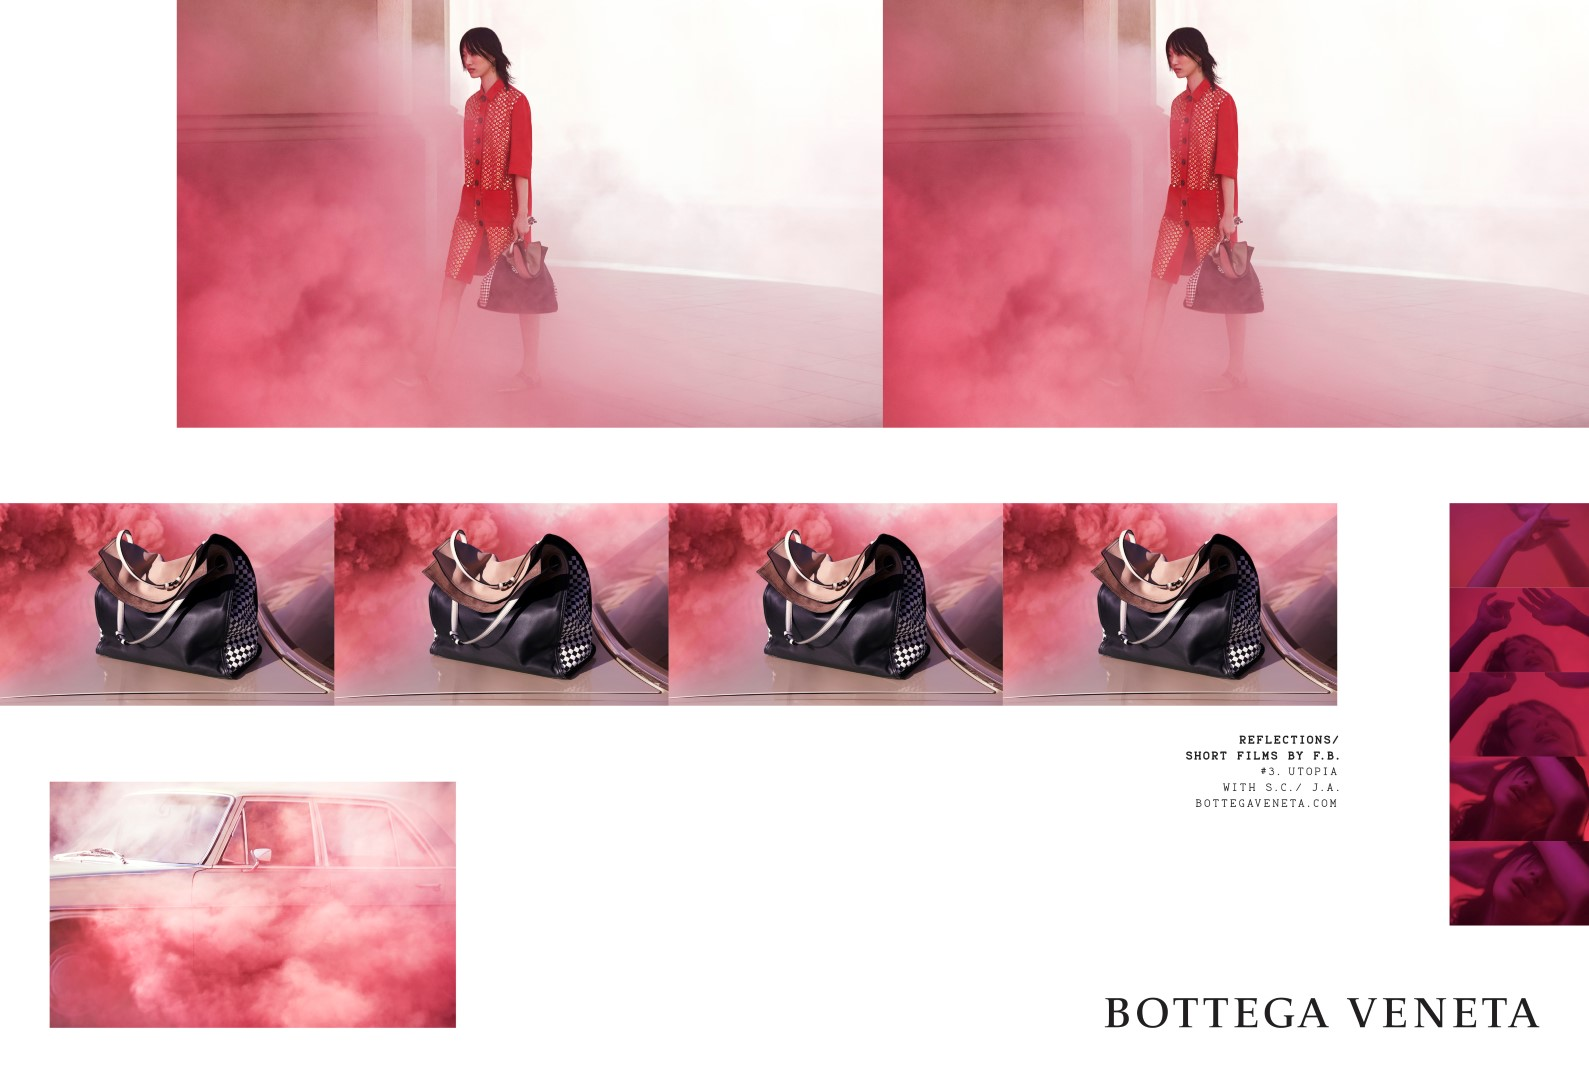 Bottega Veneta The Art of Collaboration primavera estate 2018